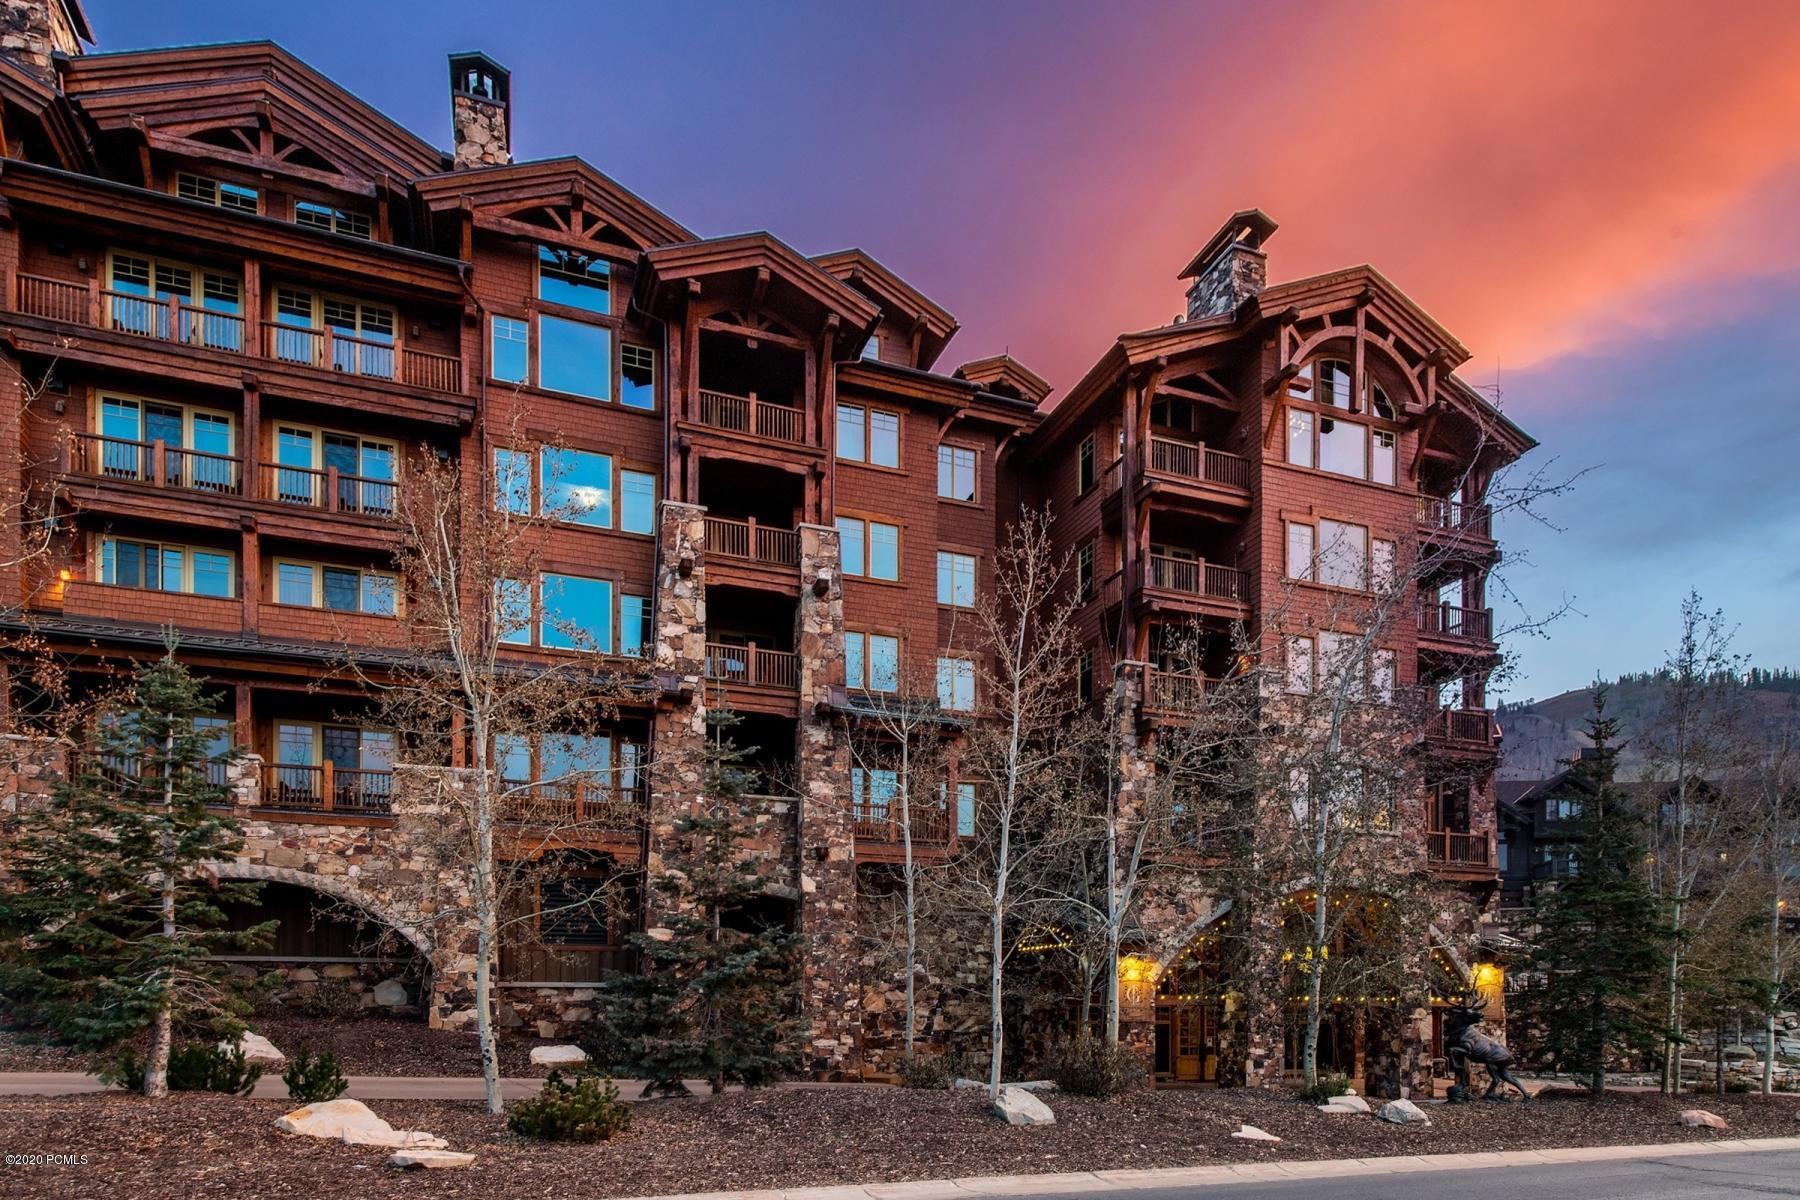 8777 Marsac Avenue, Park City, Utah 84060, 4 Bedrooms Bedrooms, ,5 BathroomsBathrooms,Condominium,For Sale,Marsac,12003704